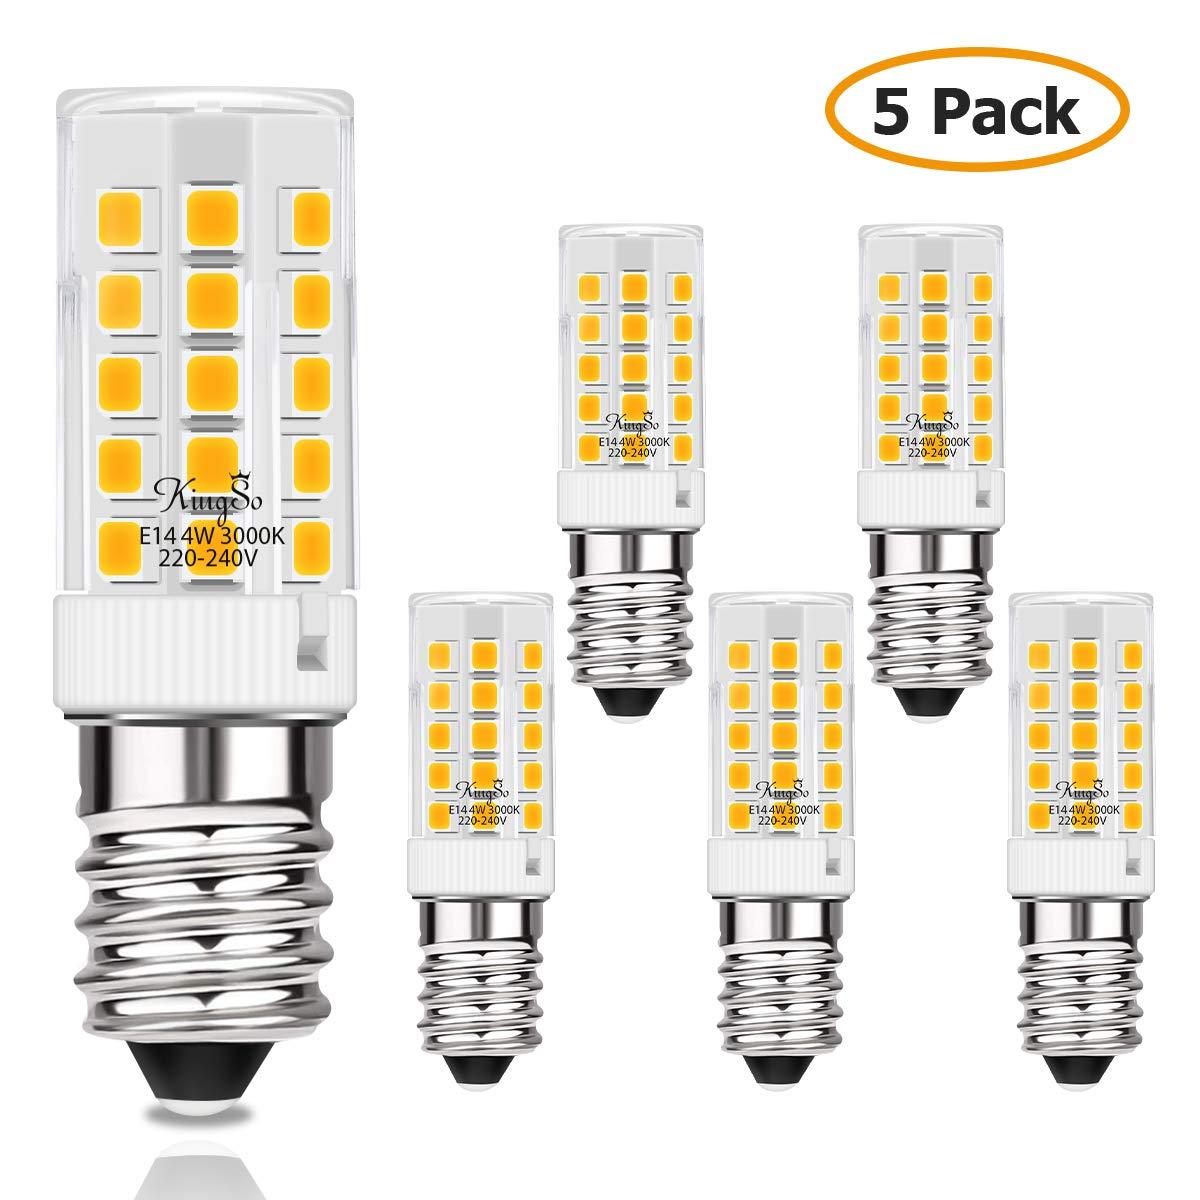 KINGSO E14 LED Lampe 4w 450lm Warmweiss Ersatz für 40W Halogenlampen